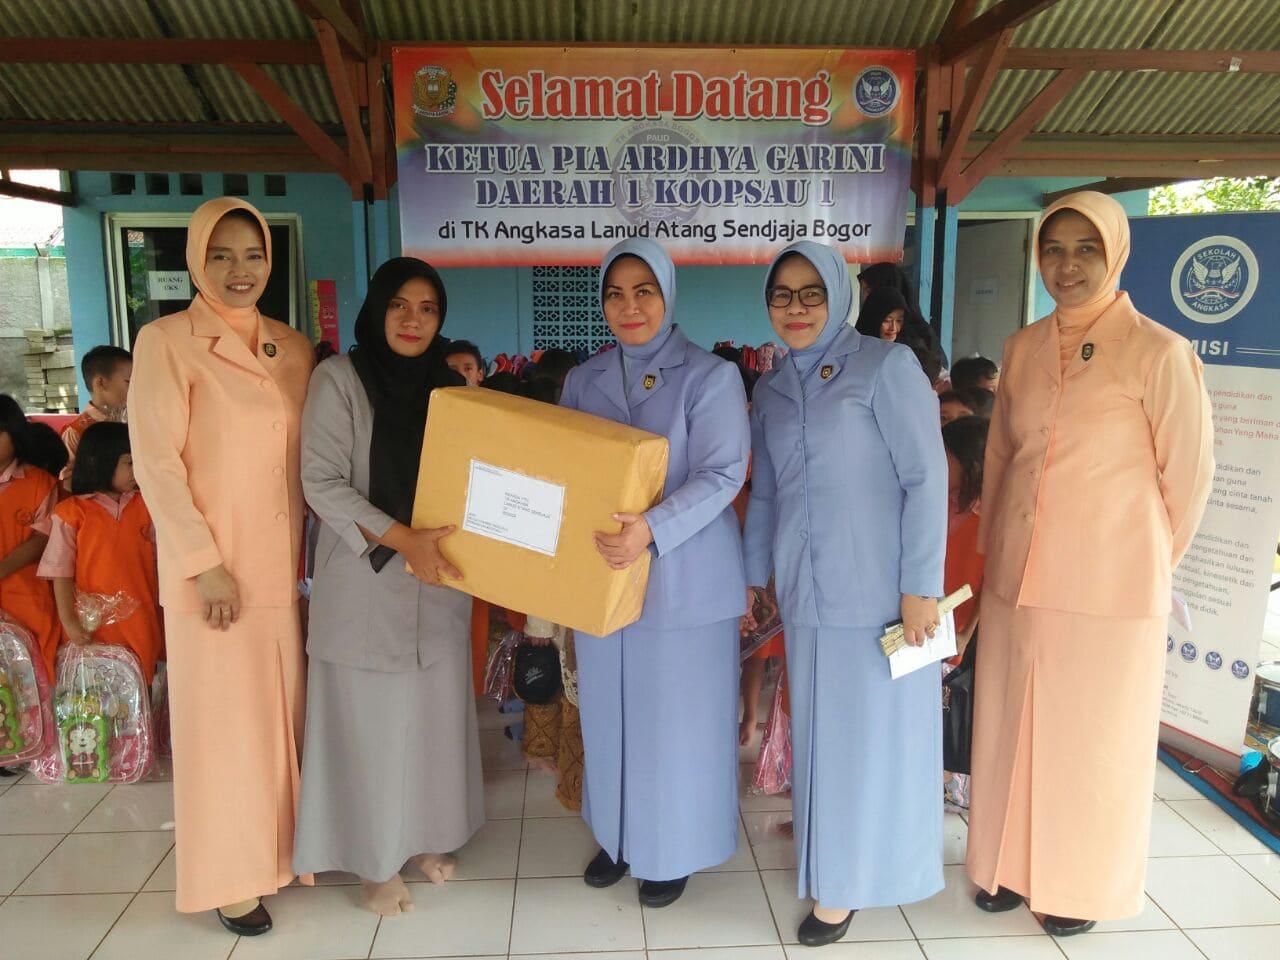 Kunjungan Kerja Ketua PIA Ardhya Garini Daerah 1 Koopsau I Ke Lanud Ats